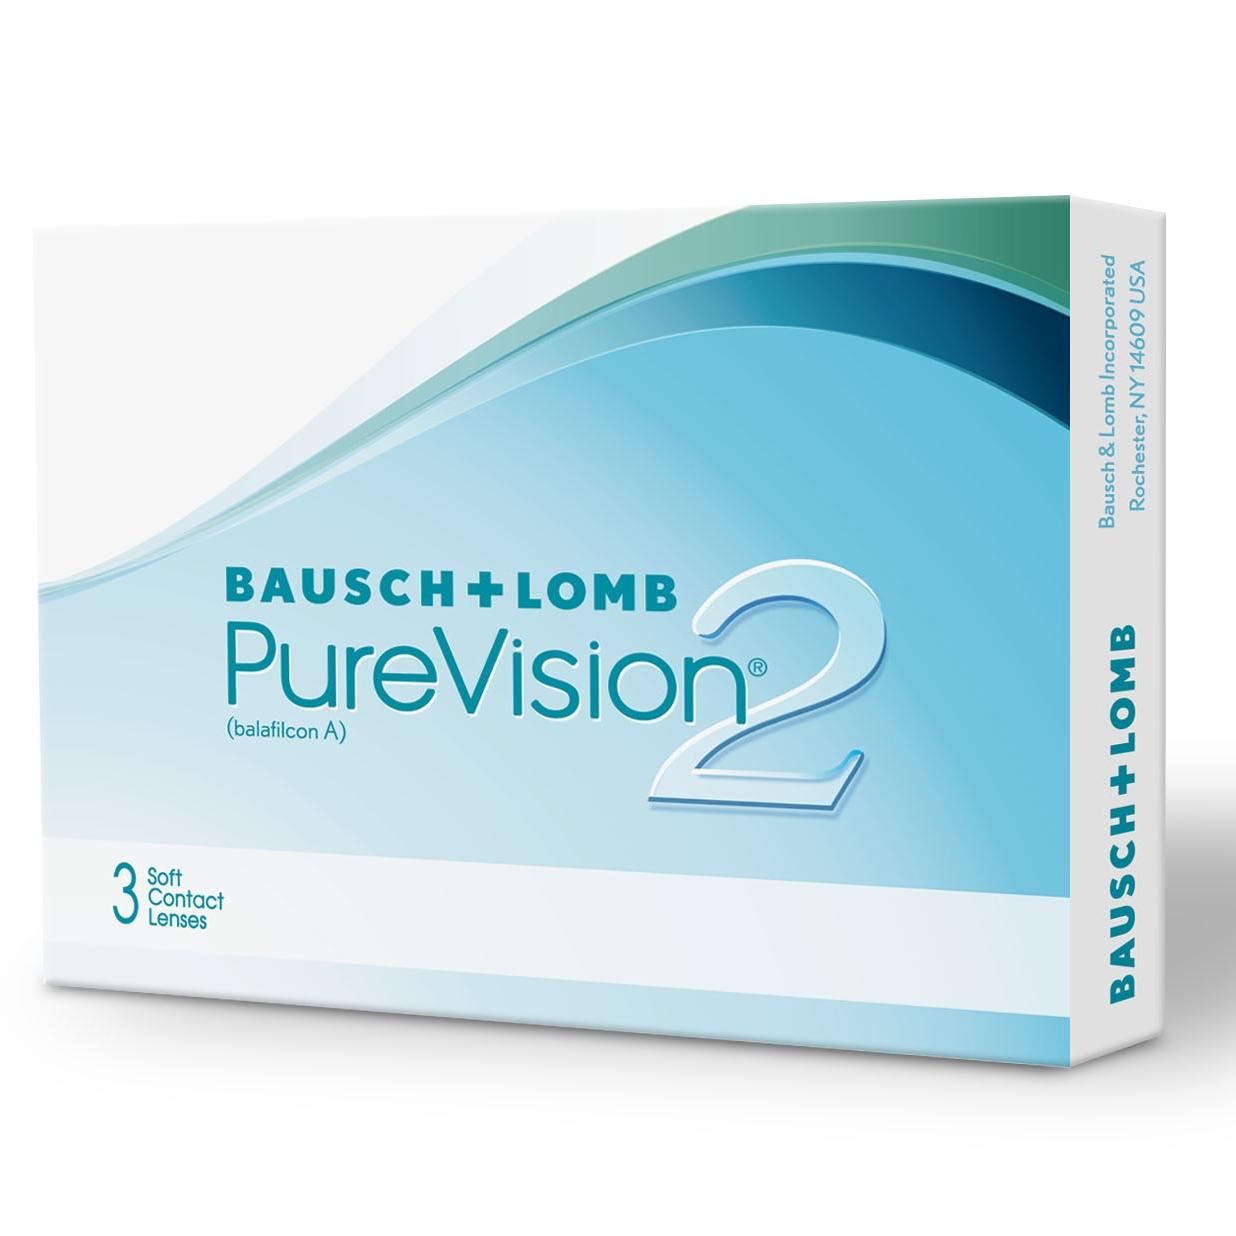 bausch lomb purevision 2 hd optika iris zrenjanin. Black Bedroom Furniture Sets. Home Design Ideas